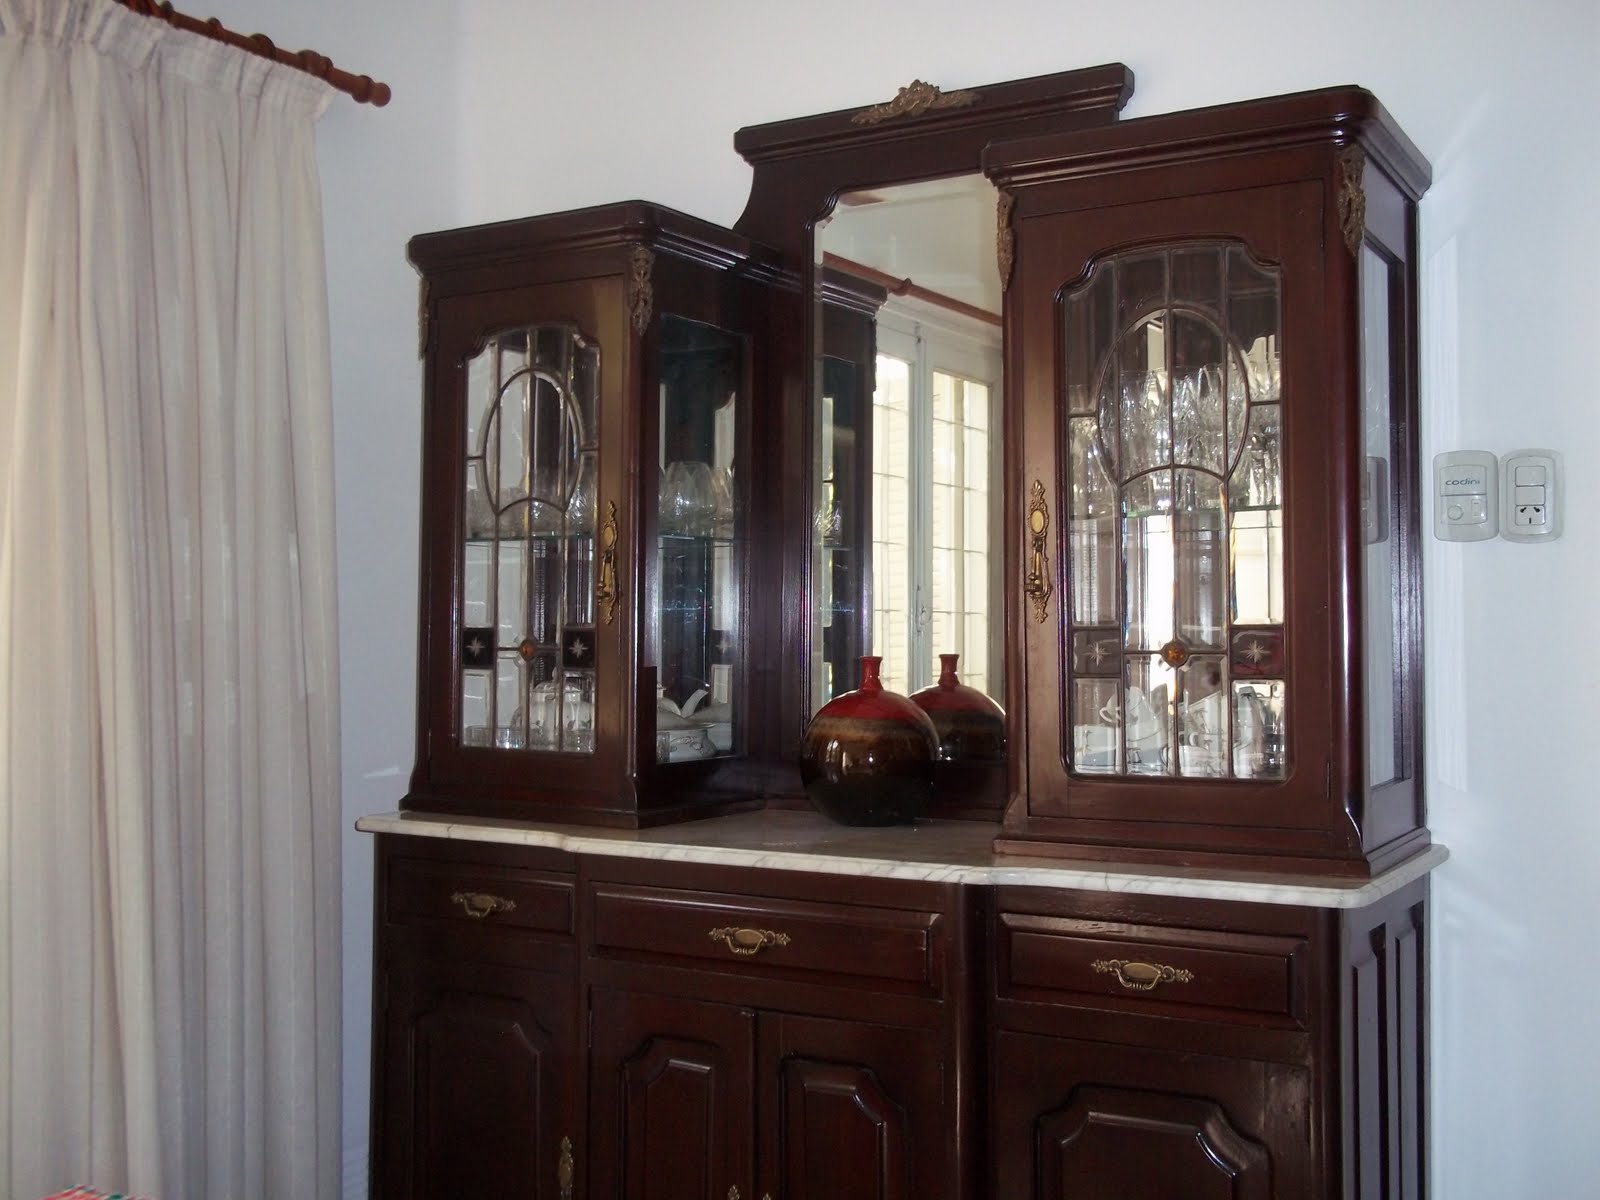 Ab muebles de dise o restauraci n de mueble vitrina antiguo for Mueble vitrina